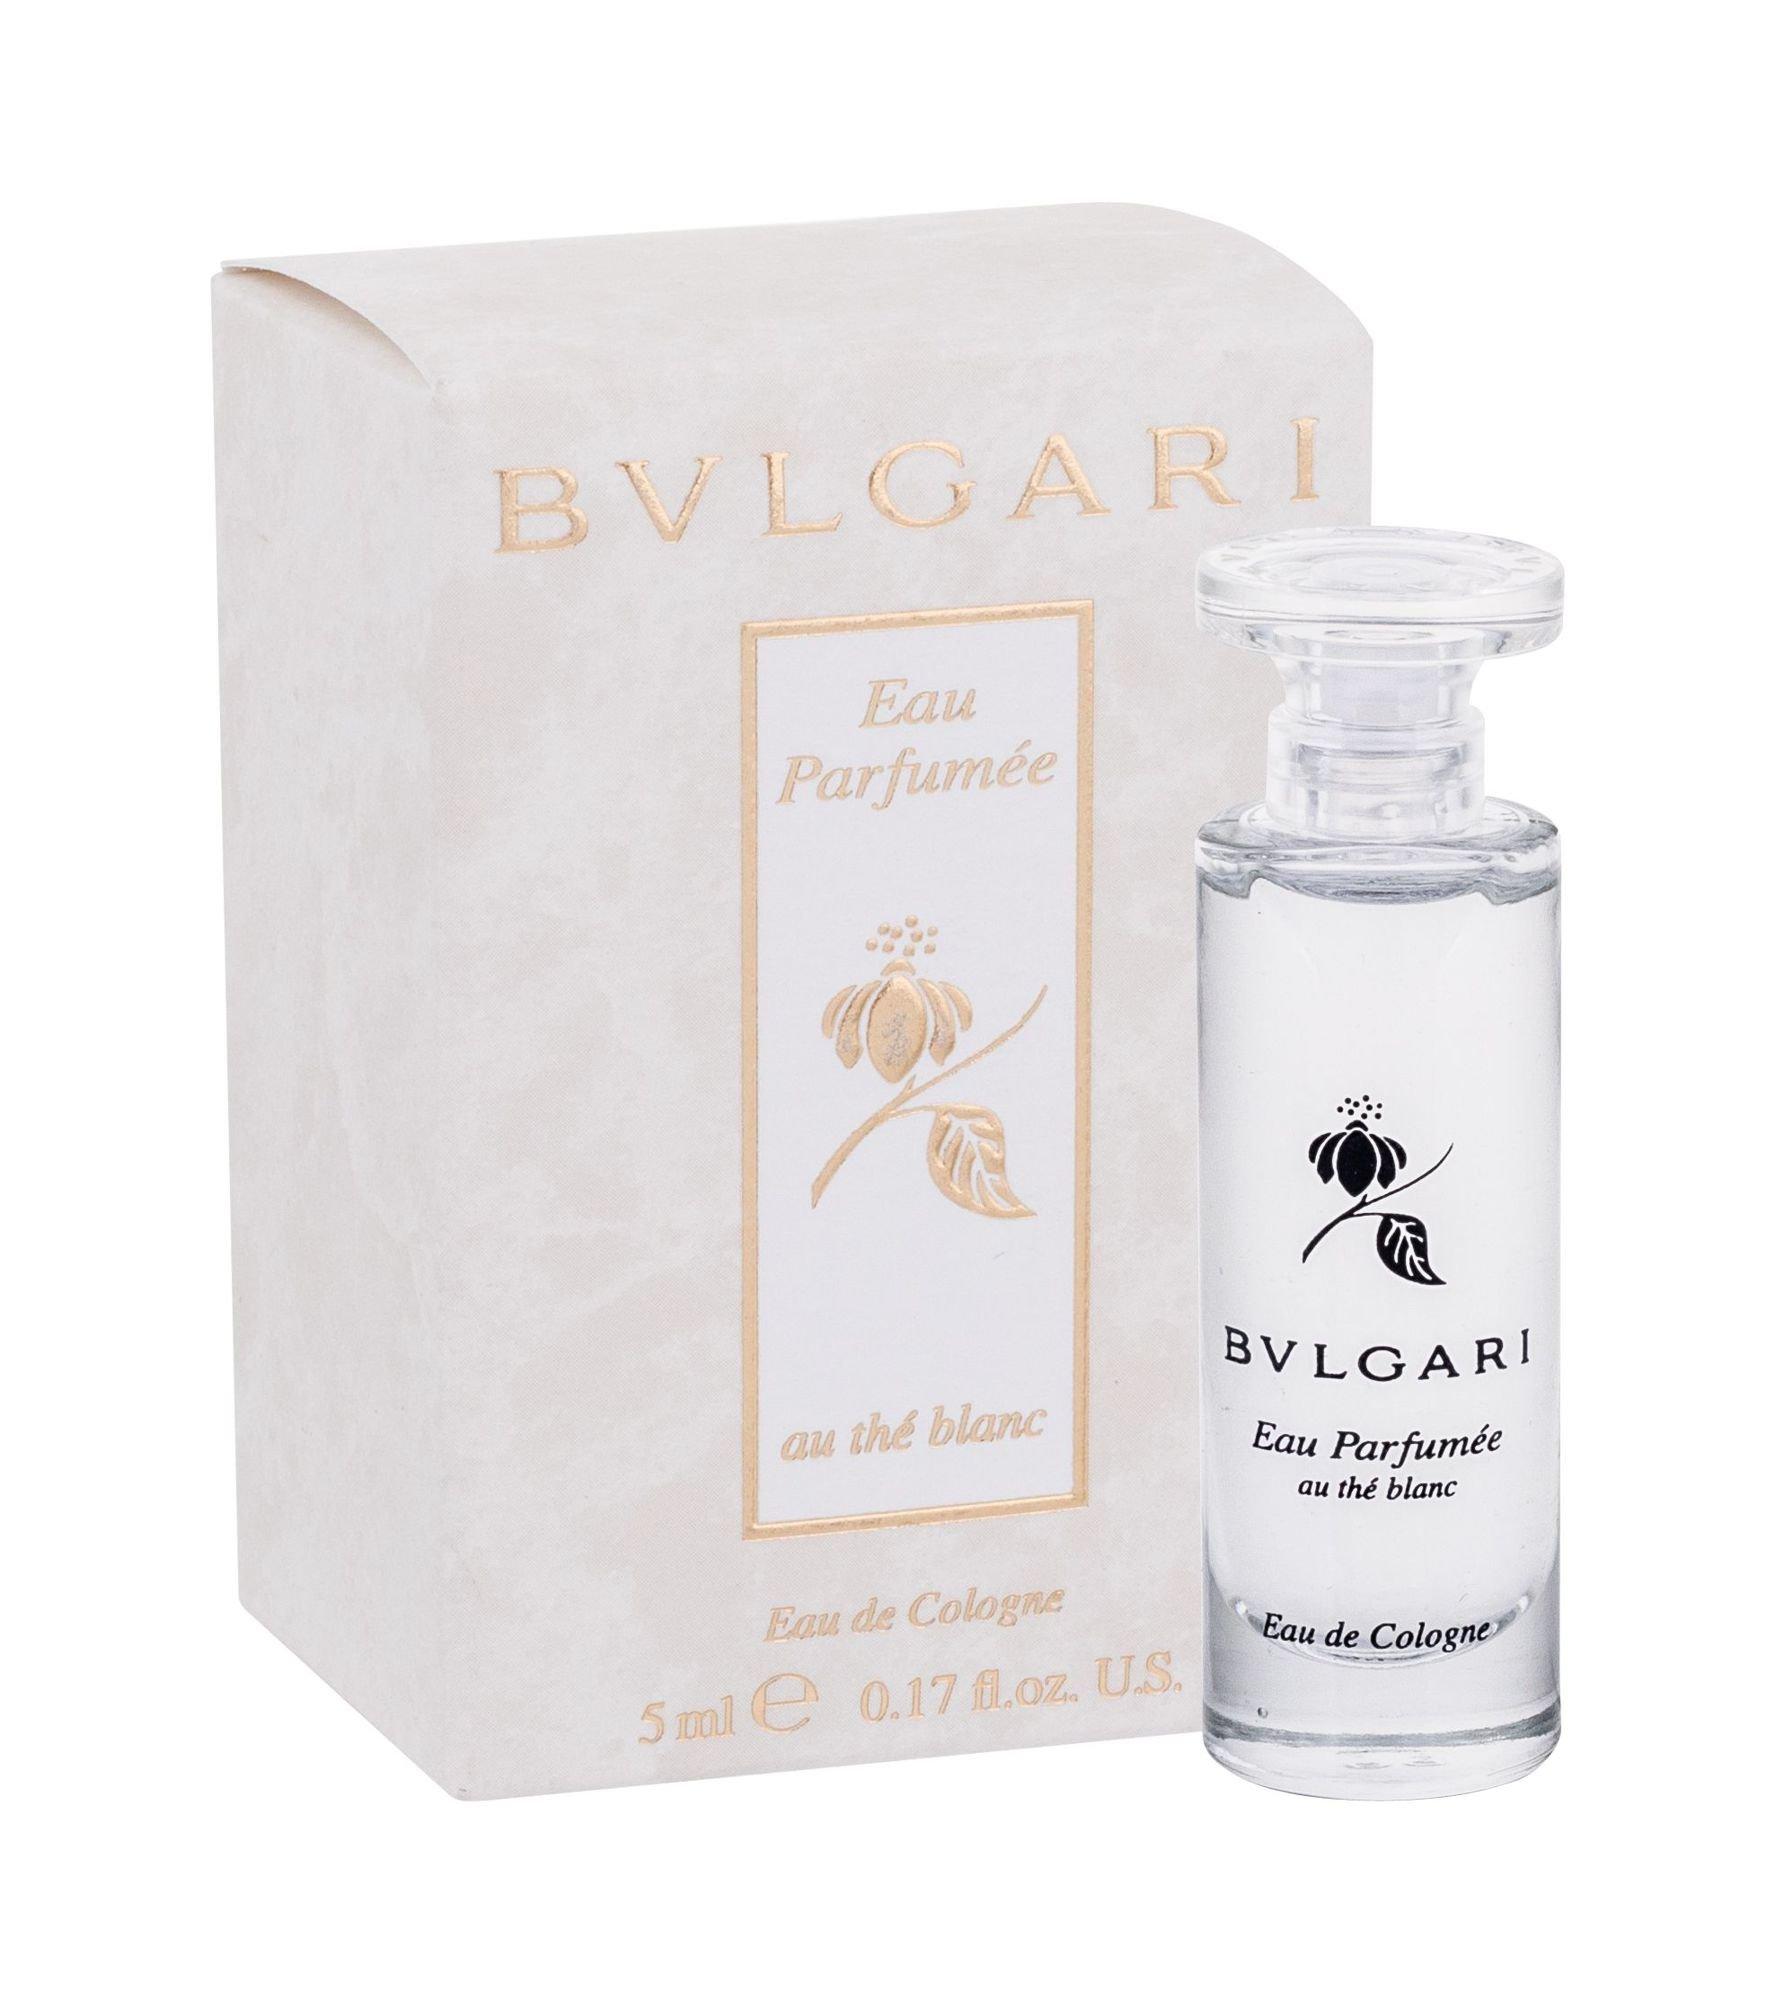 Bvlgari Eau Parfumée au Thé Blanc, Odstrek s rozprašovačom 3ml